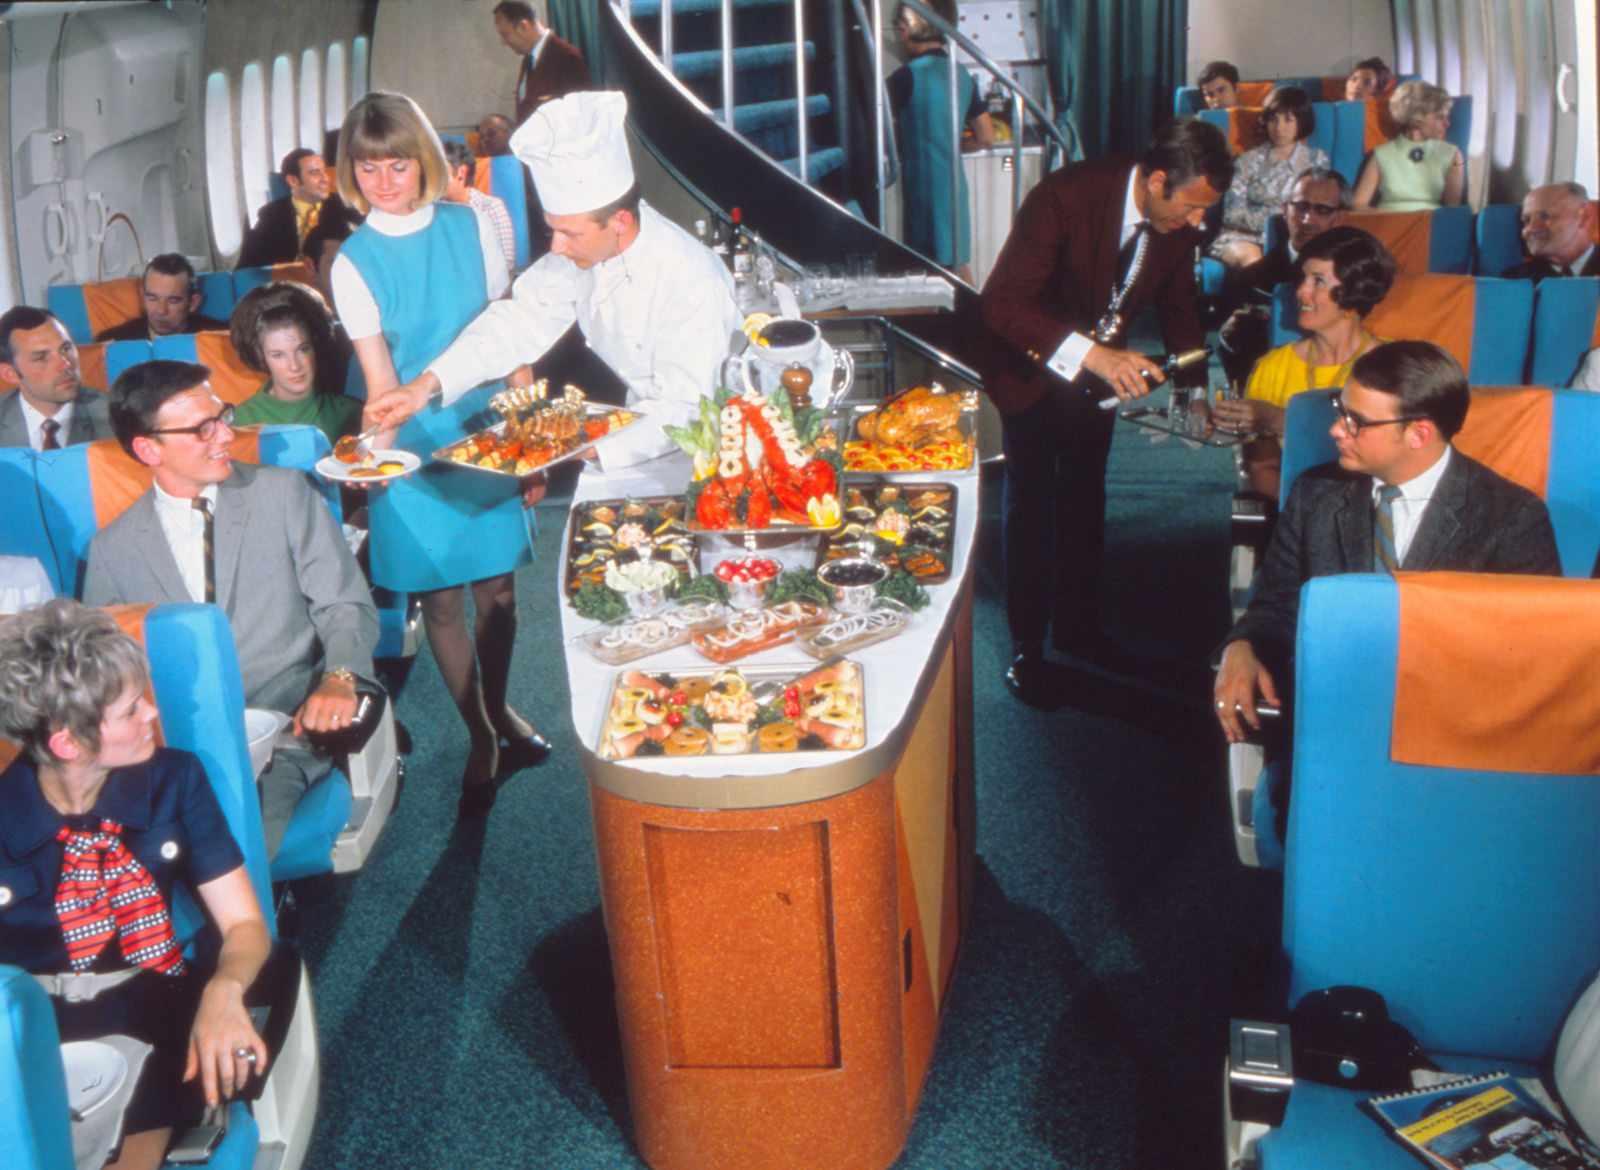 SAS buffet